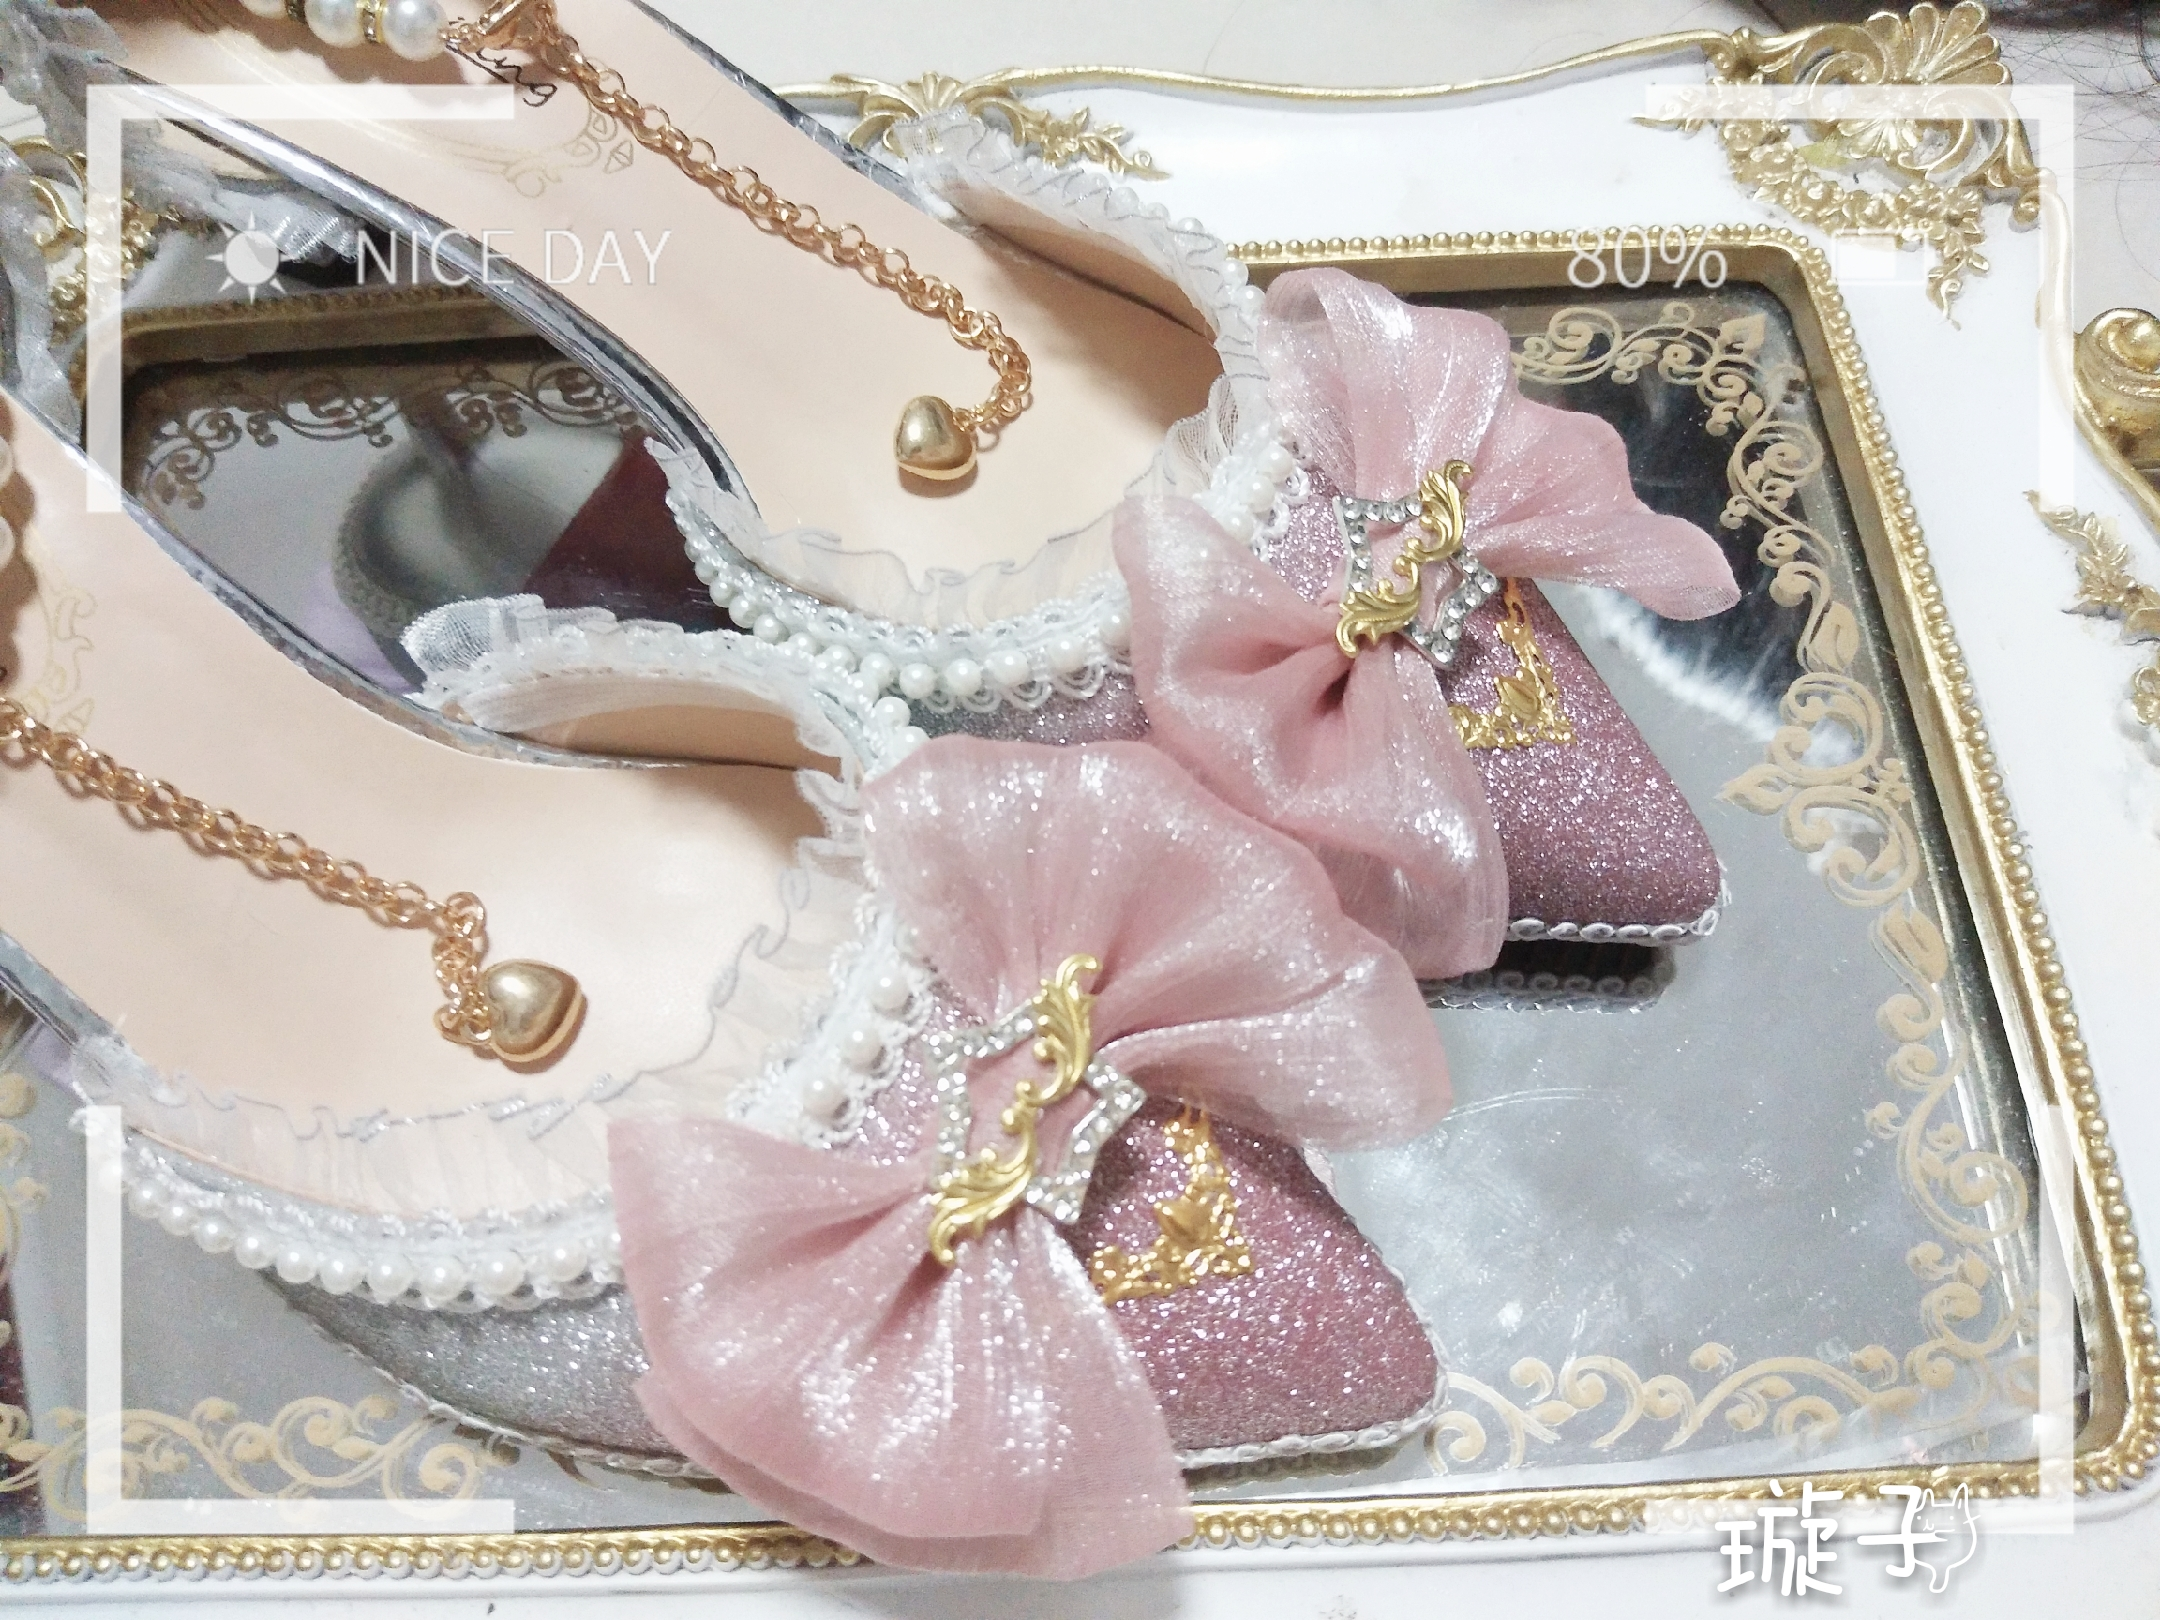 Sweet lolita shoes vintage round head low heel women shoes cute bowknot cross bandage kawaii shoes loli cosplay kawaii girl